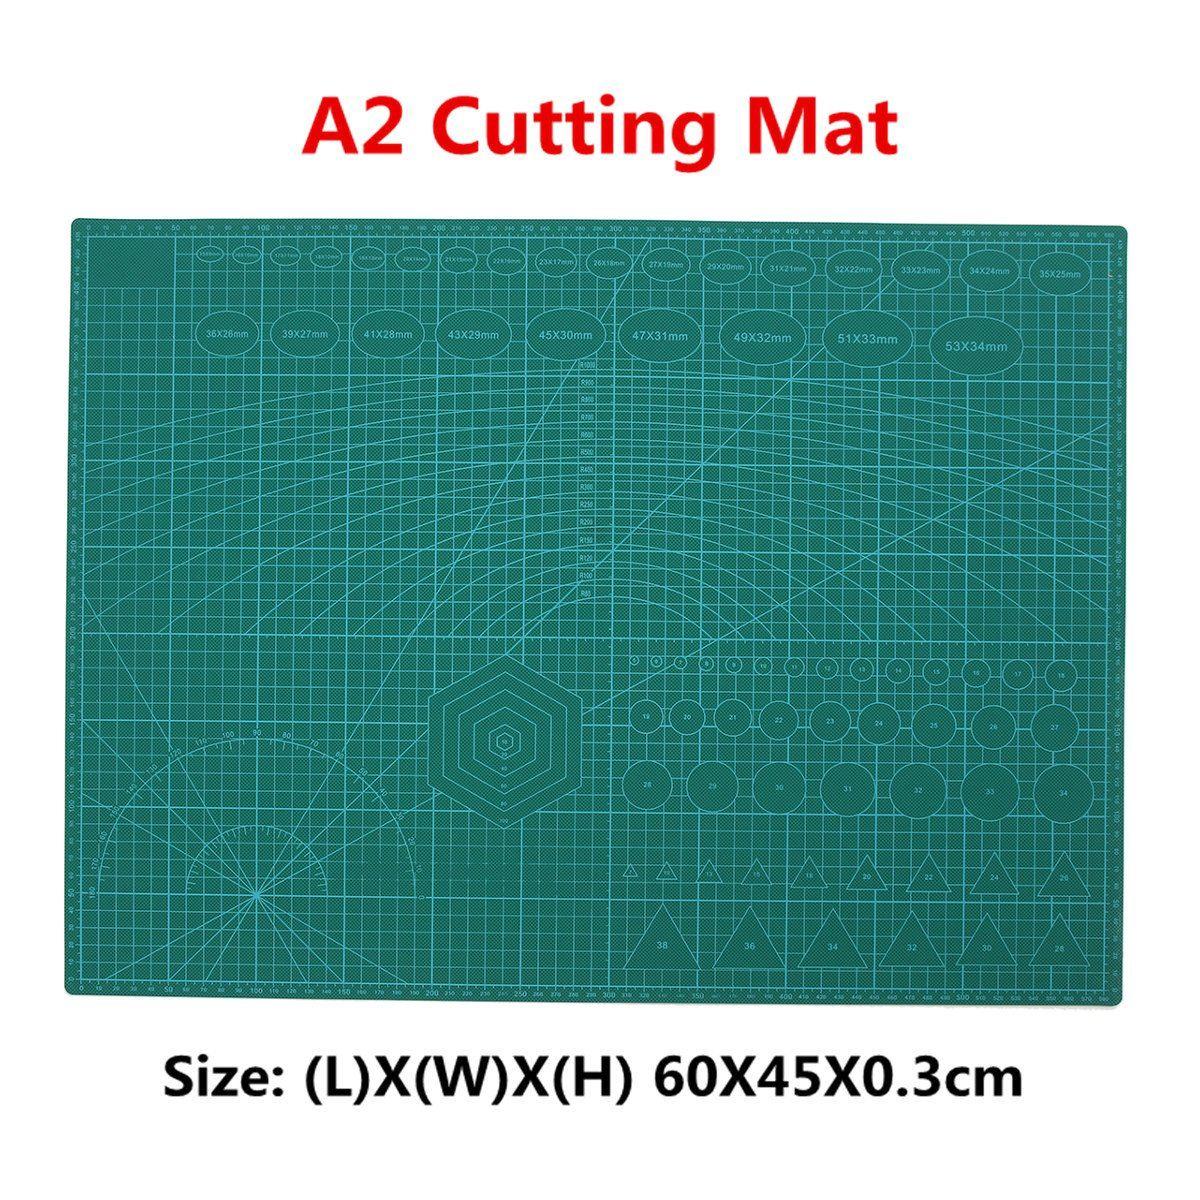 A2 PVC Cutting Mat Cutting Pad Patchwork Double Printed Self Healing Cutting Mat Craft Quilting Scrapbooking Board 45X60CM 3mm